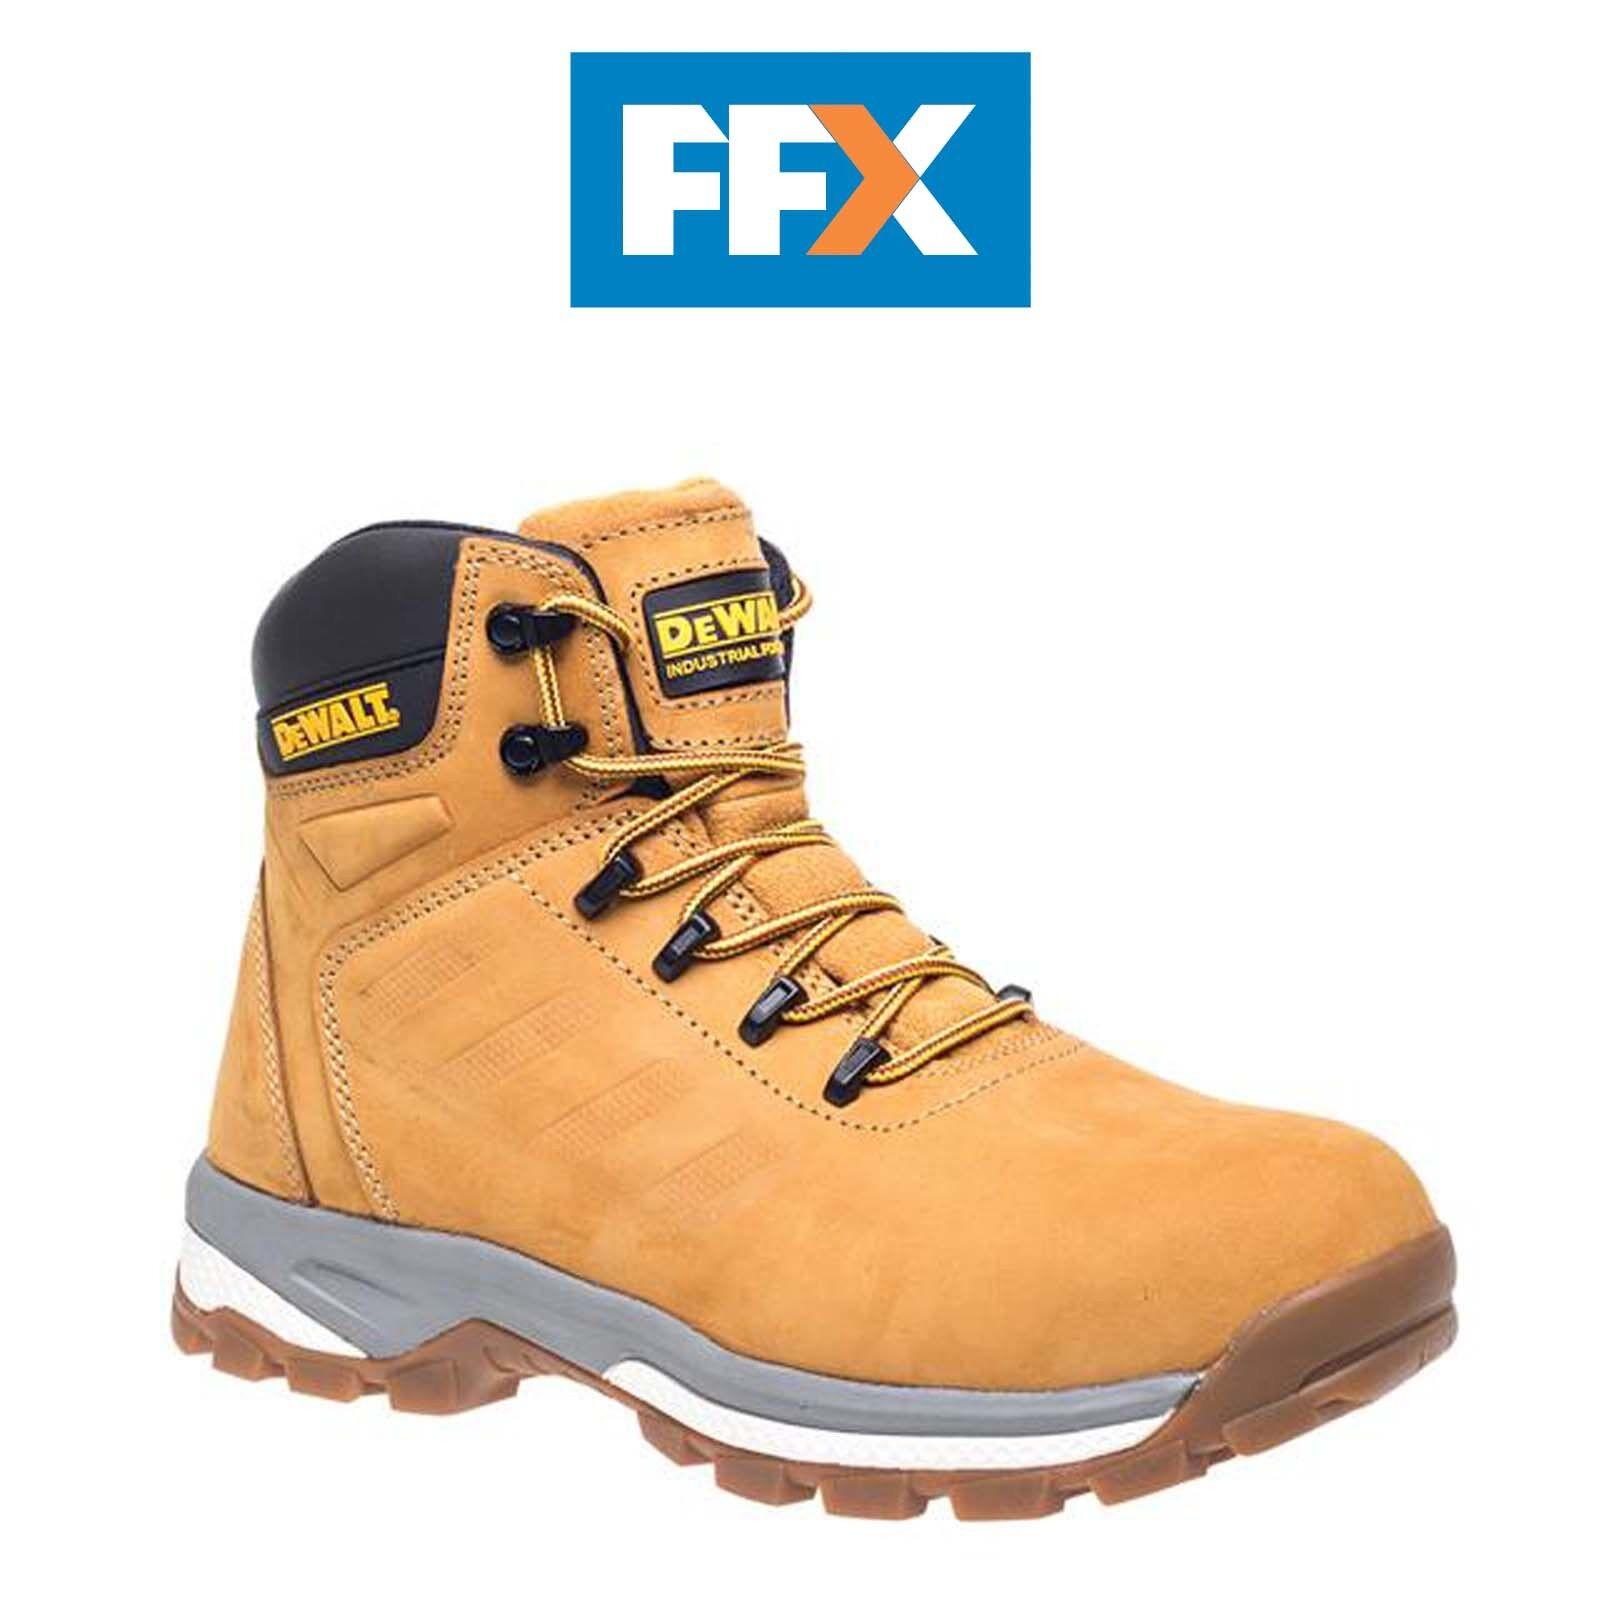 Dewalt Sharpsburg Sb Wheat Hiker Boots Uk 12 Euro 47 Home & Garden Yard, Garden & Outdoor Living